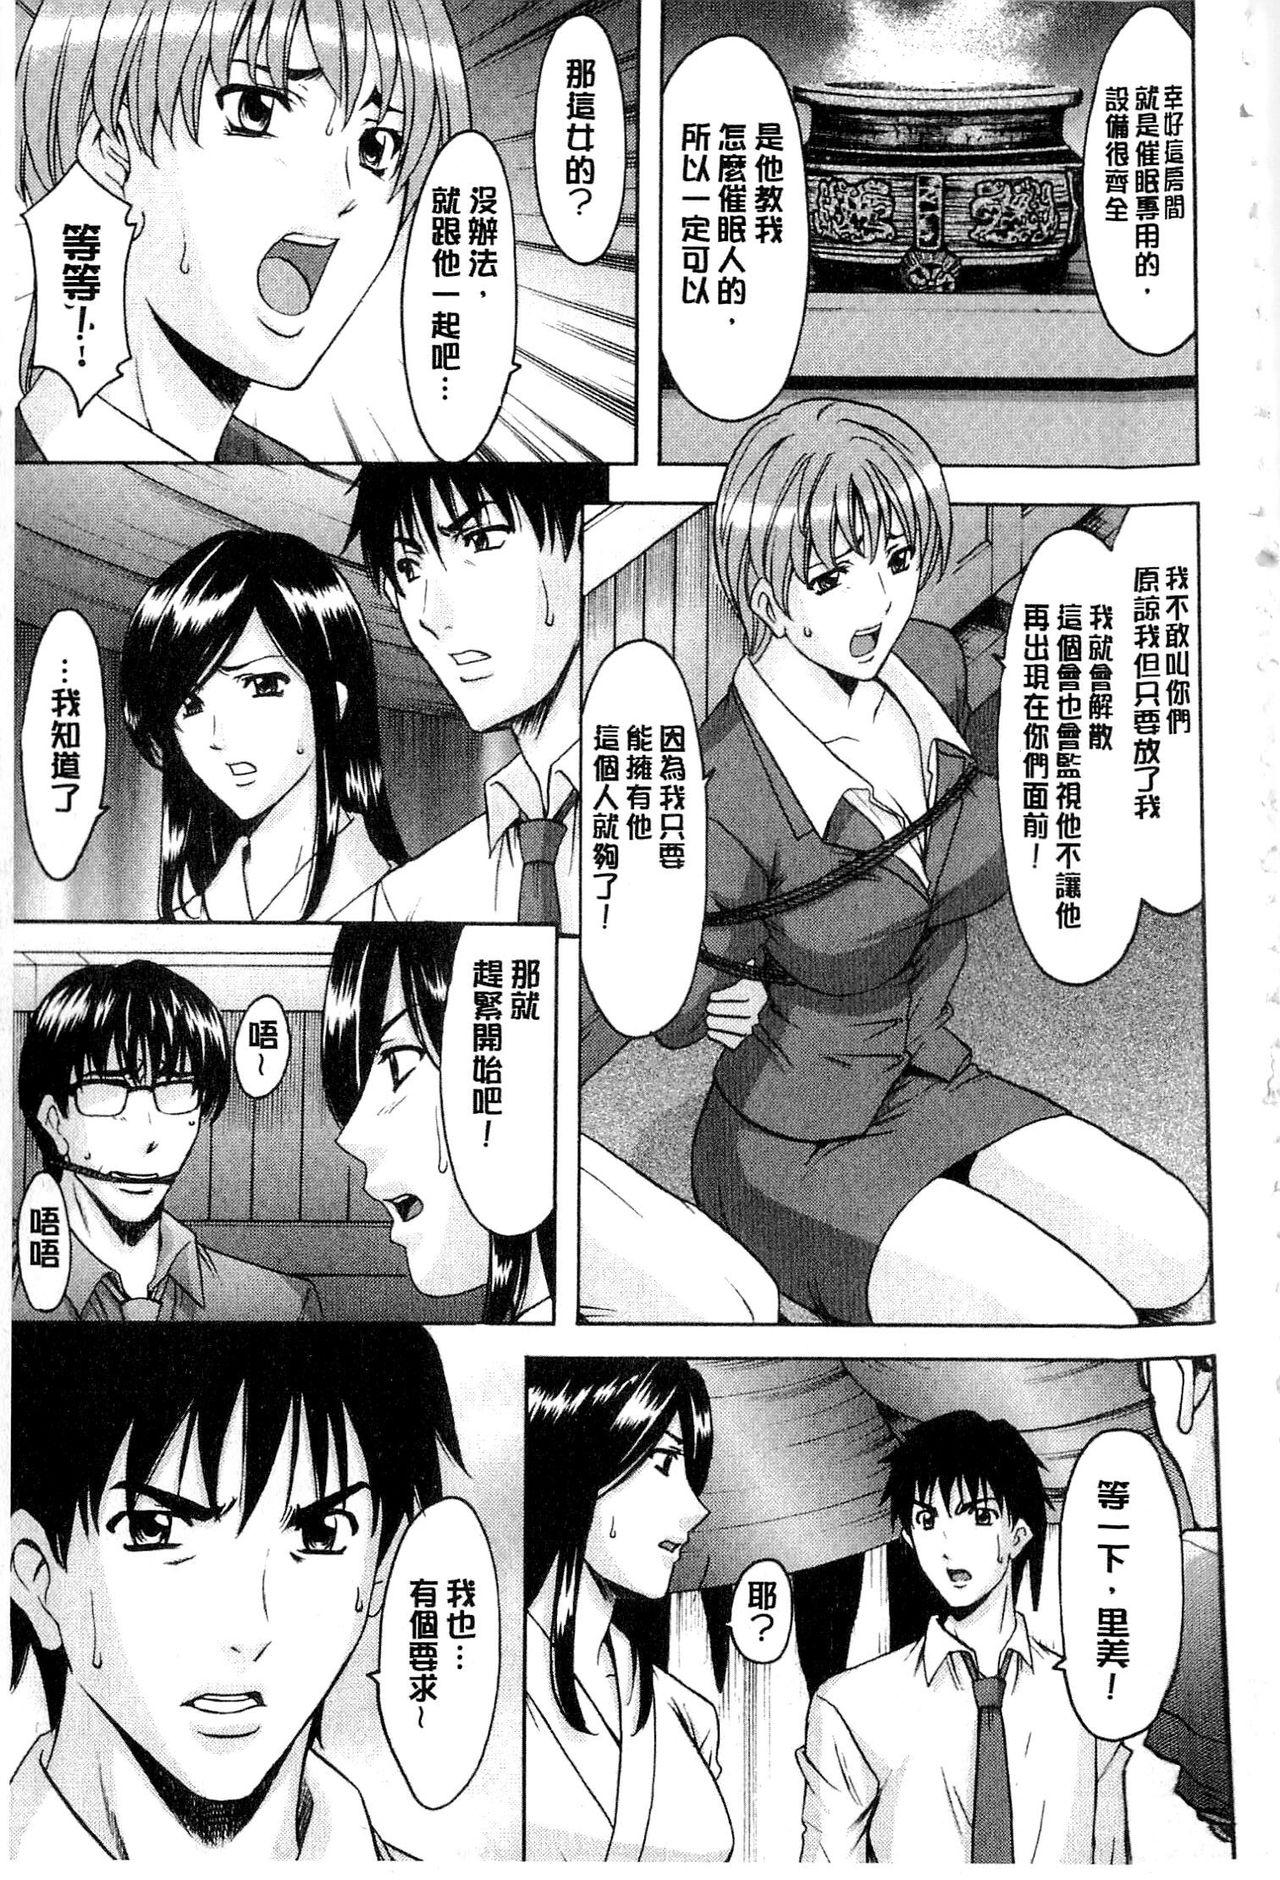 Sennyu Tsuma Satomi Kiroku   臥底人妻里美 洗腦凌辱的記錄 下集 159